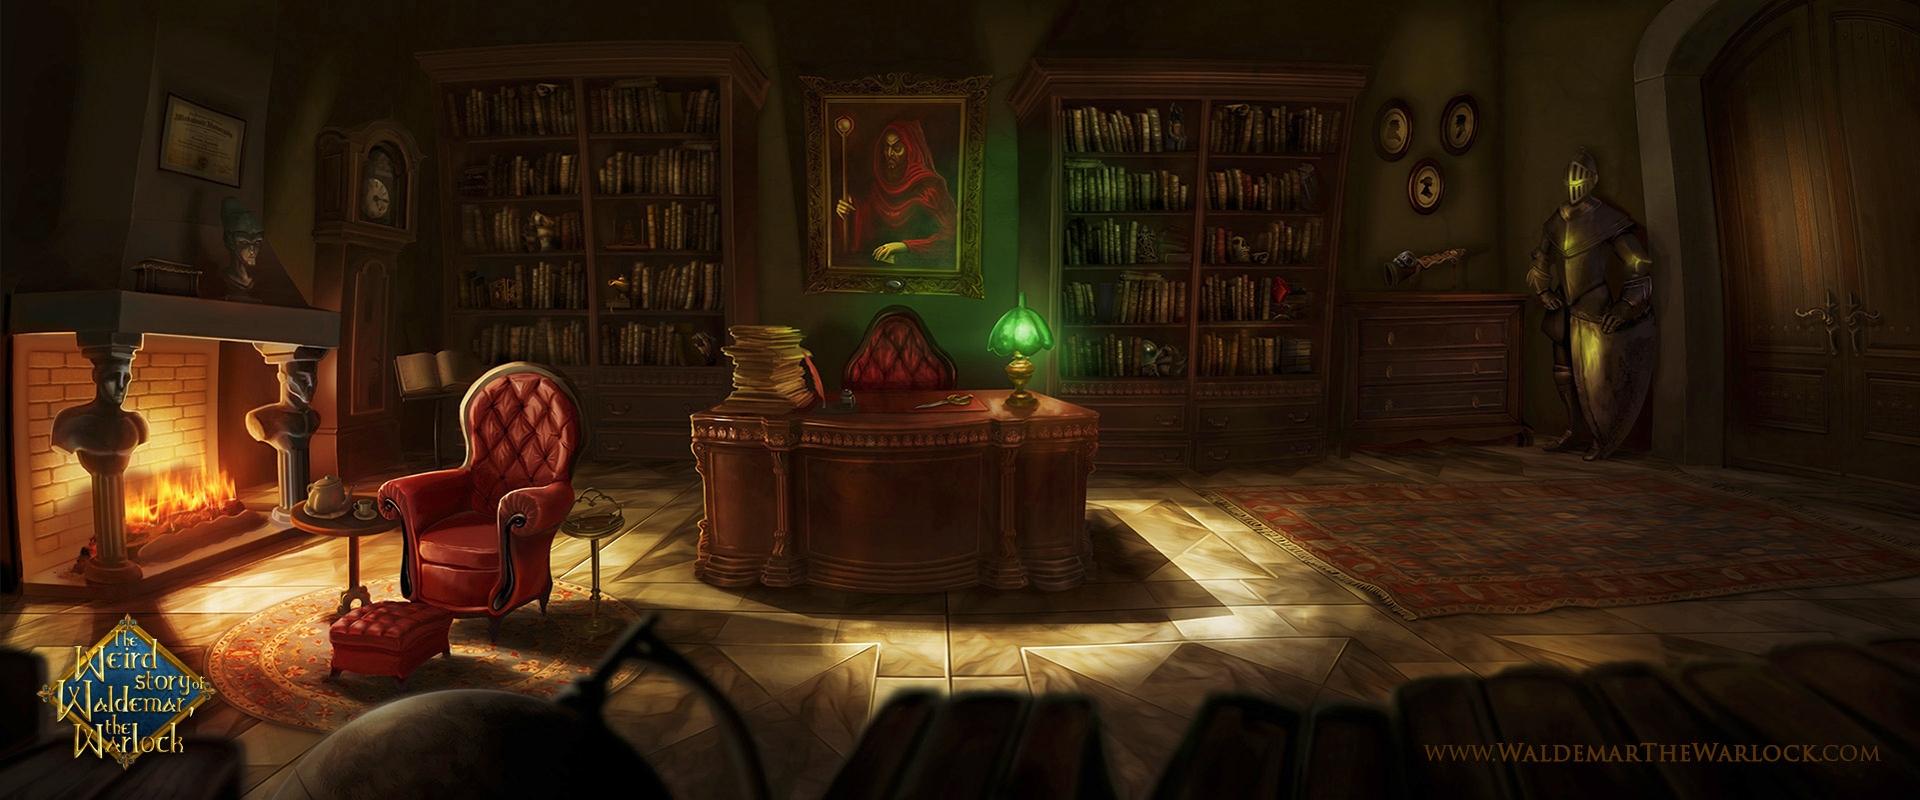 the-weird-story-of-waldemar-the-warlock-363029